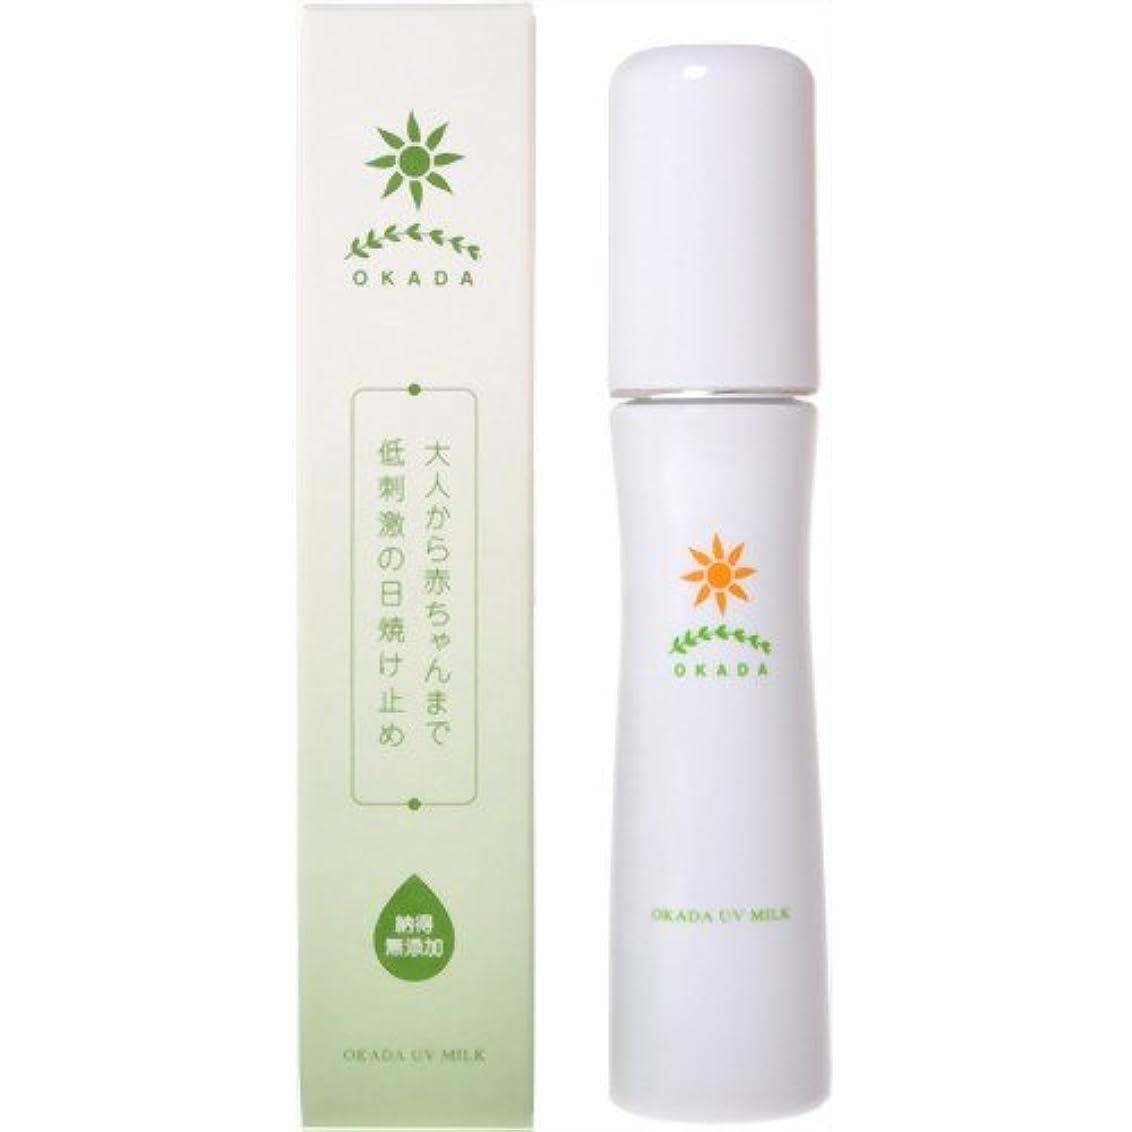 初期便利有益無添加工房OKADA 天然由来100% 岡田UVミルク(日焼け止め乳液) 50g